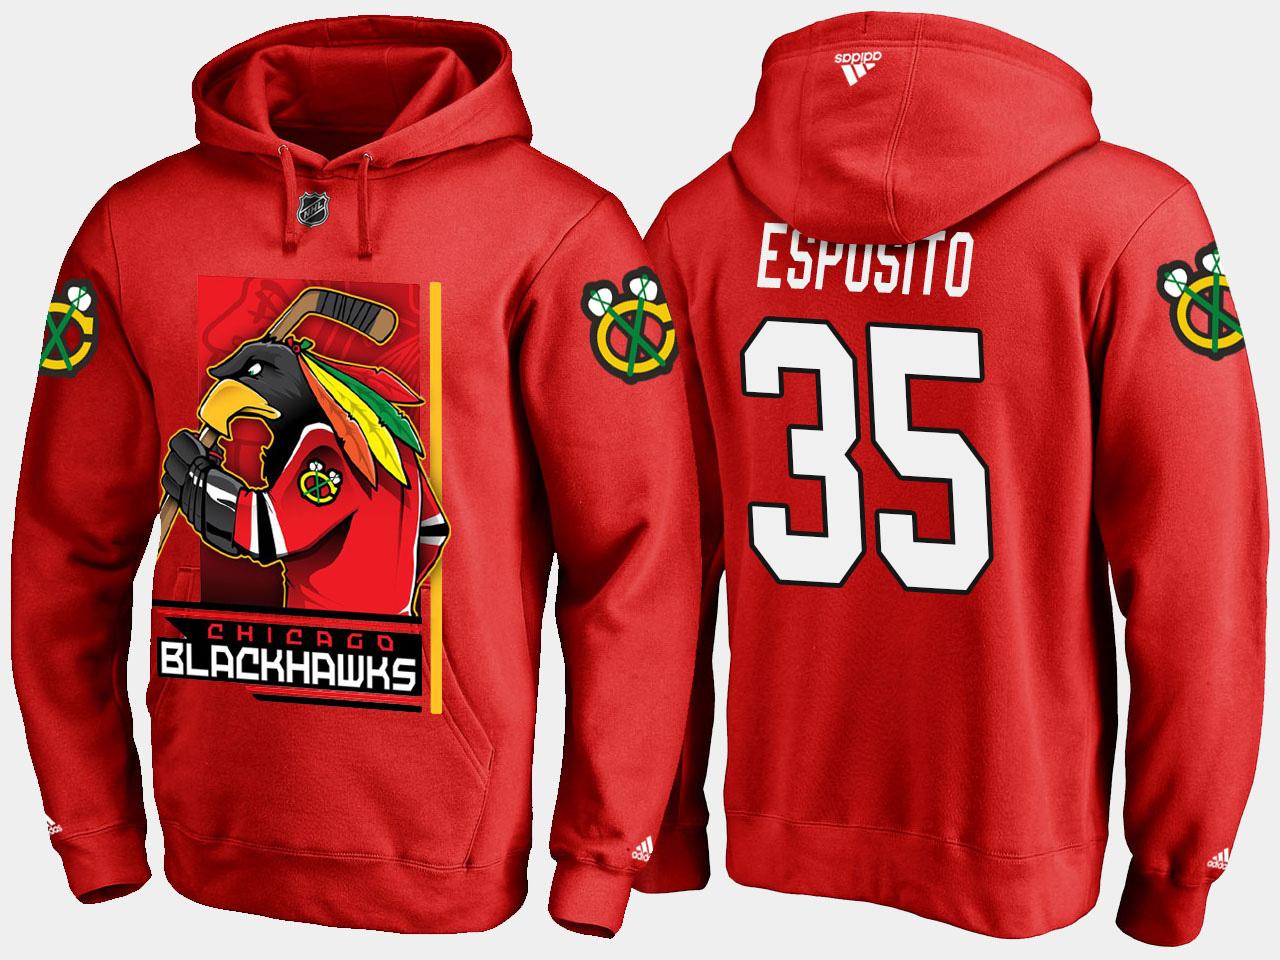 Men's Red Chicago Blackhawks Tony Esposito Cartoon Hoodie